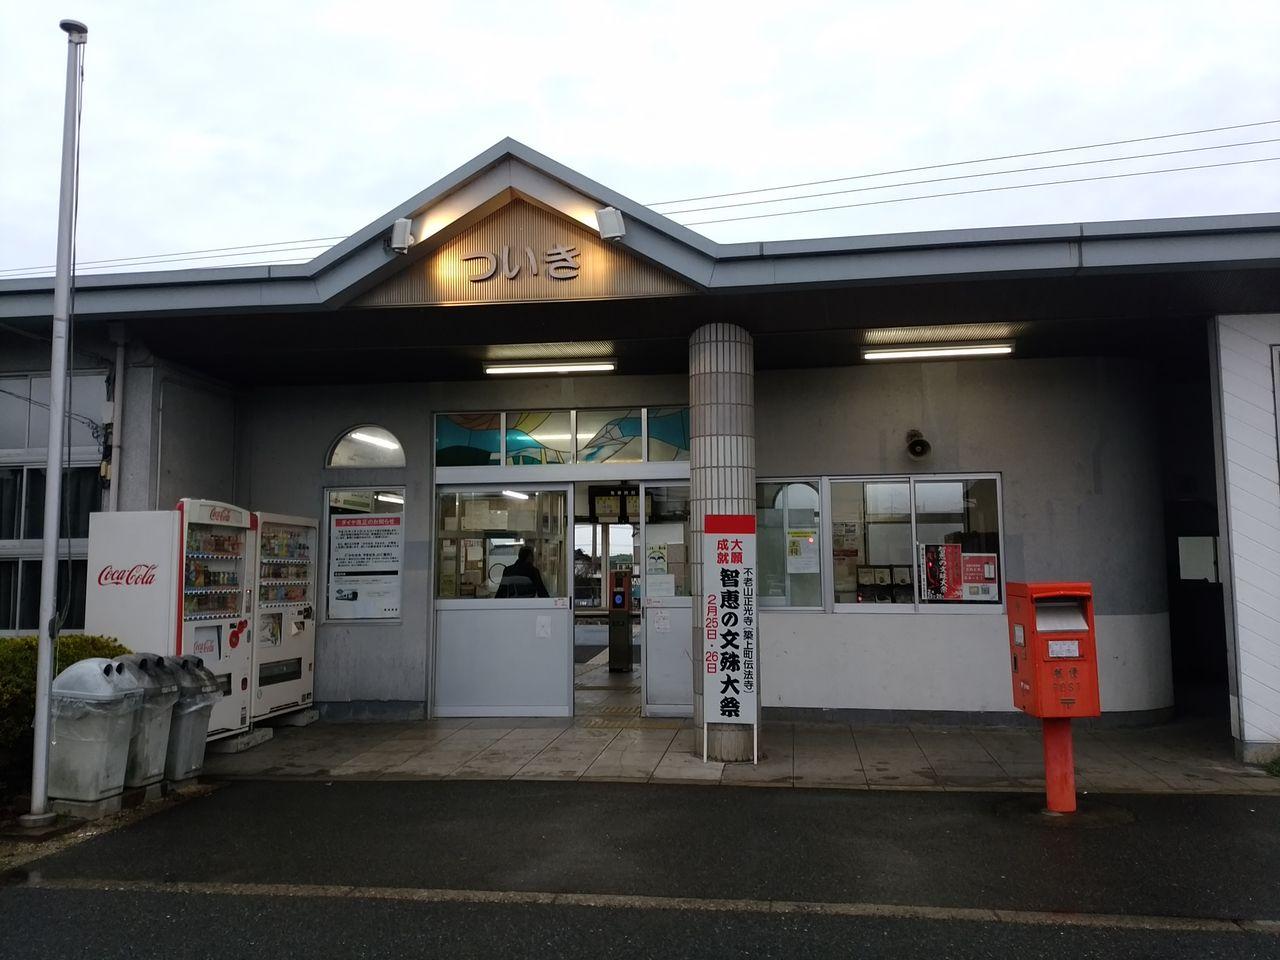 JR 日豊本線 築城駅 スタンプ : スタンプを集めよう!